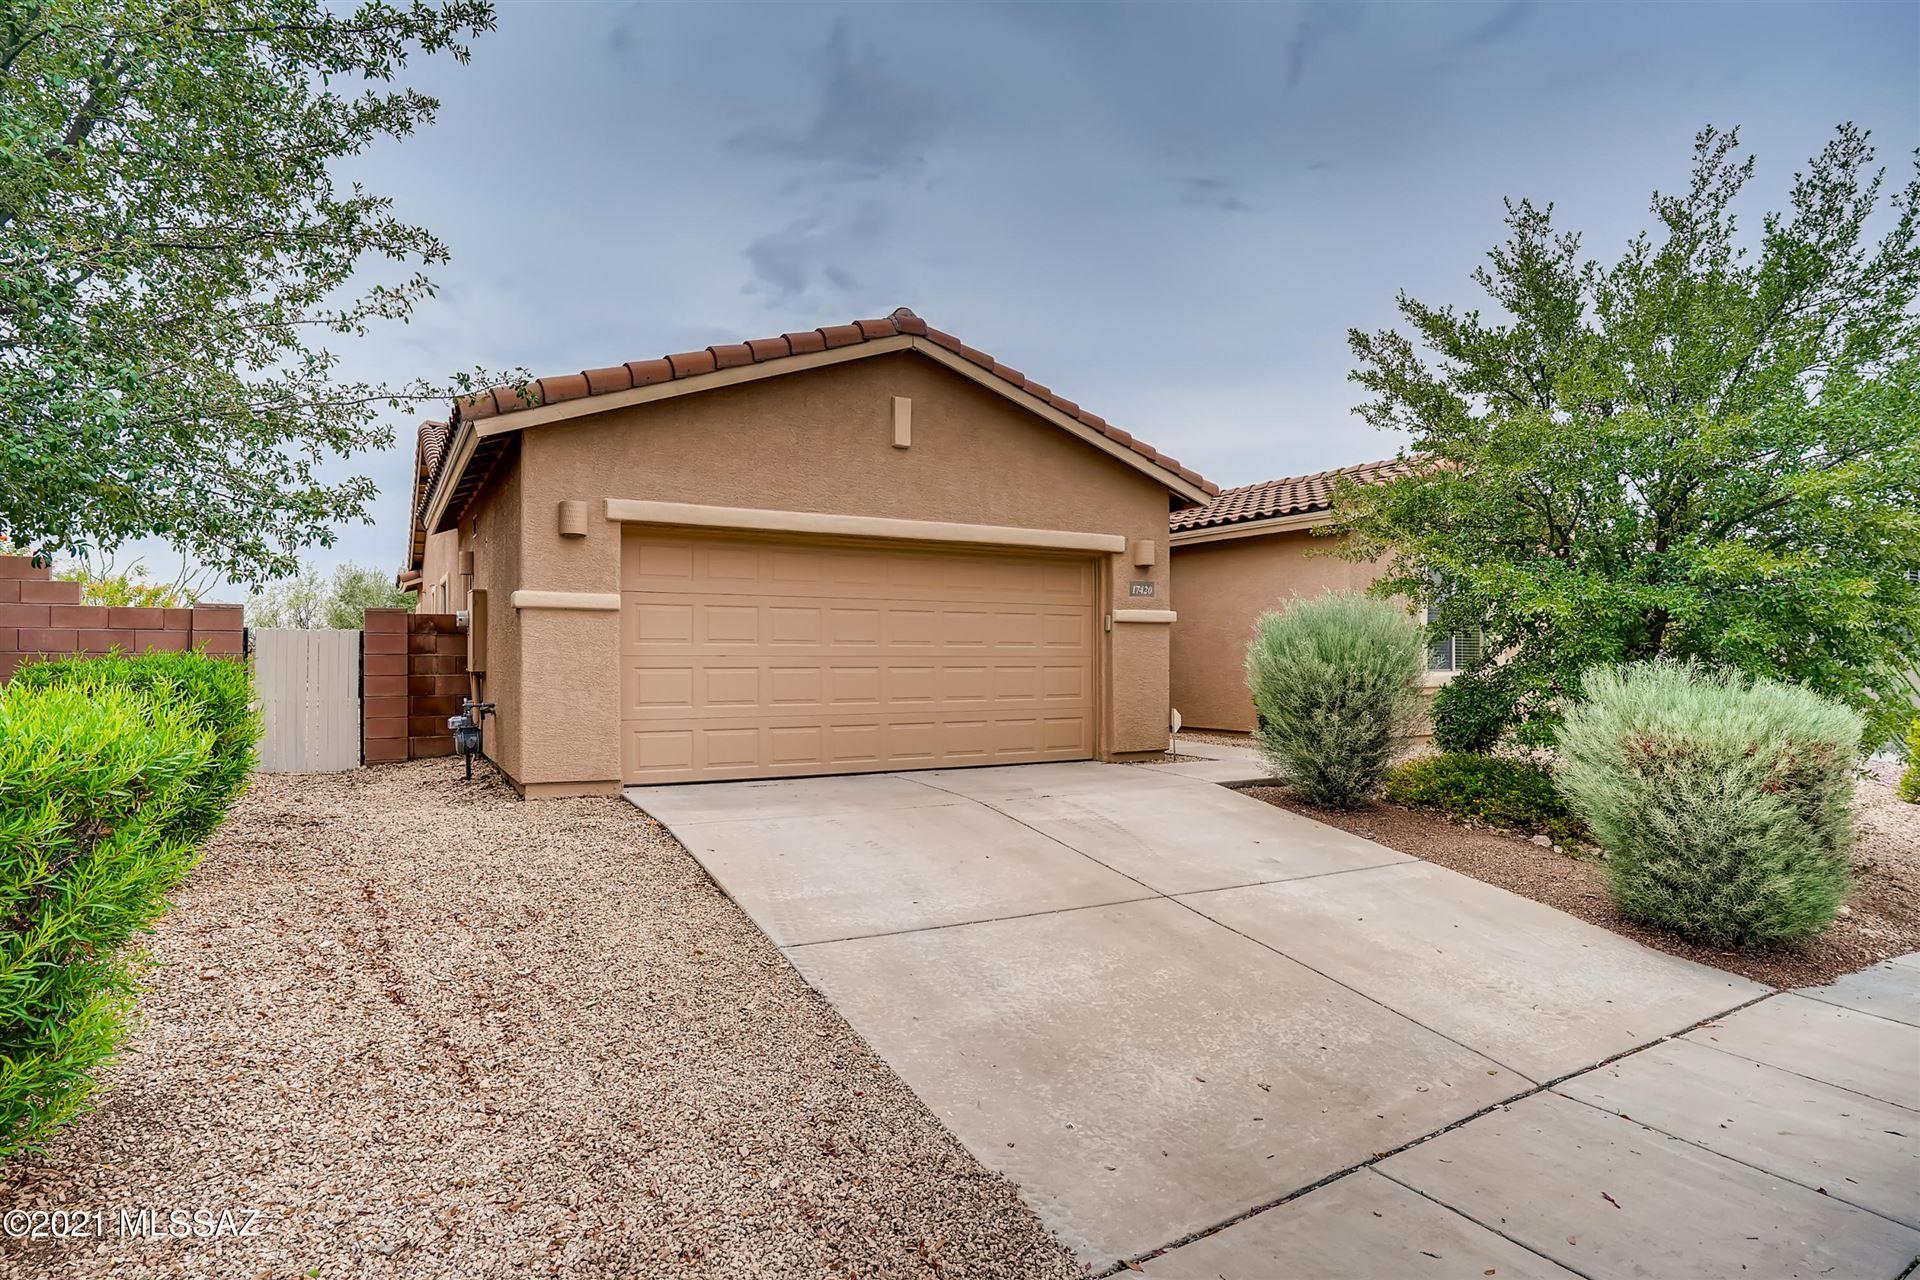 17420 S Indigo Mesa Pass, Vail, AZ 85641 - MLS#: 22118067